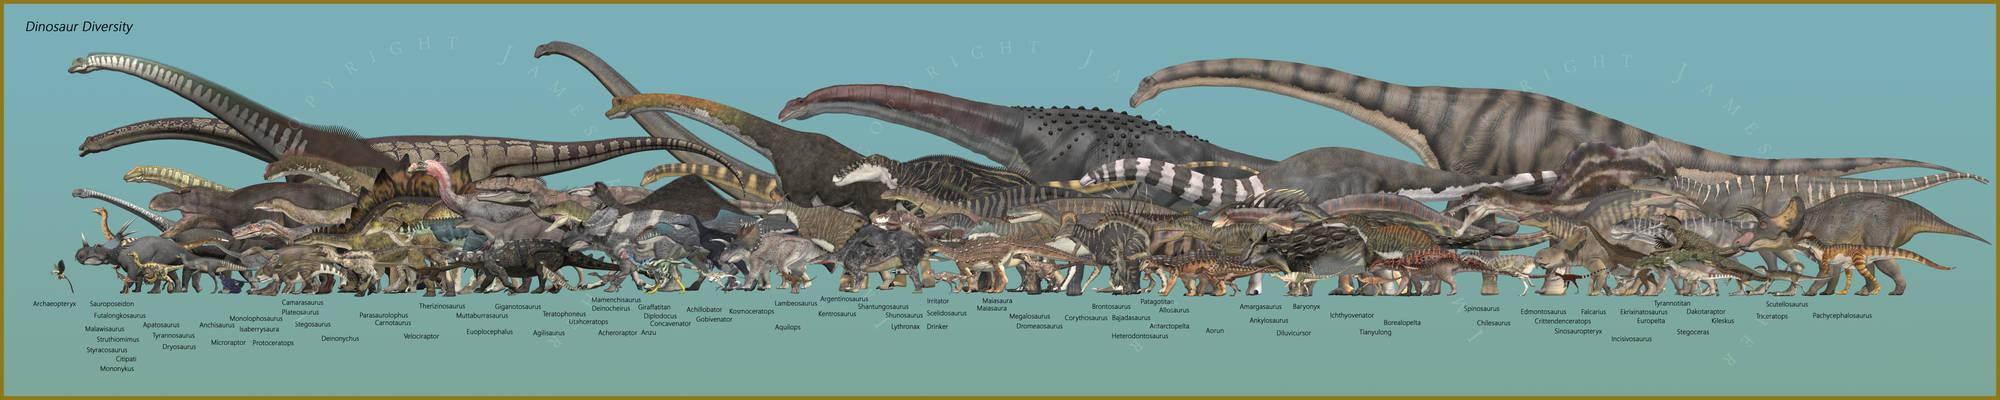 Dinosaur Diversity